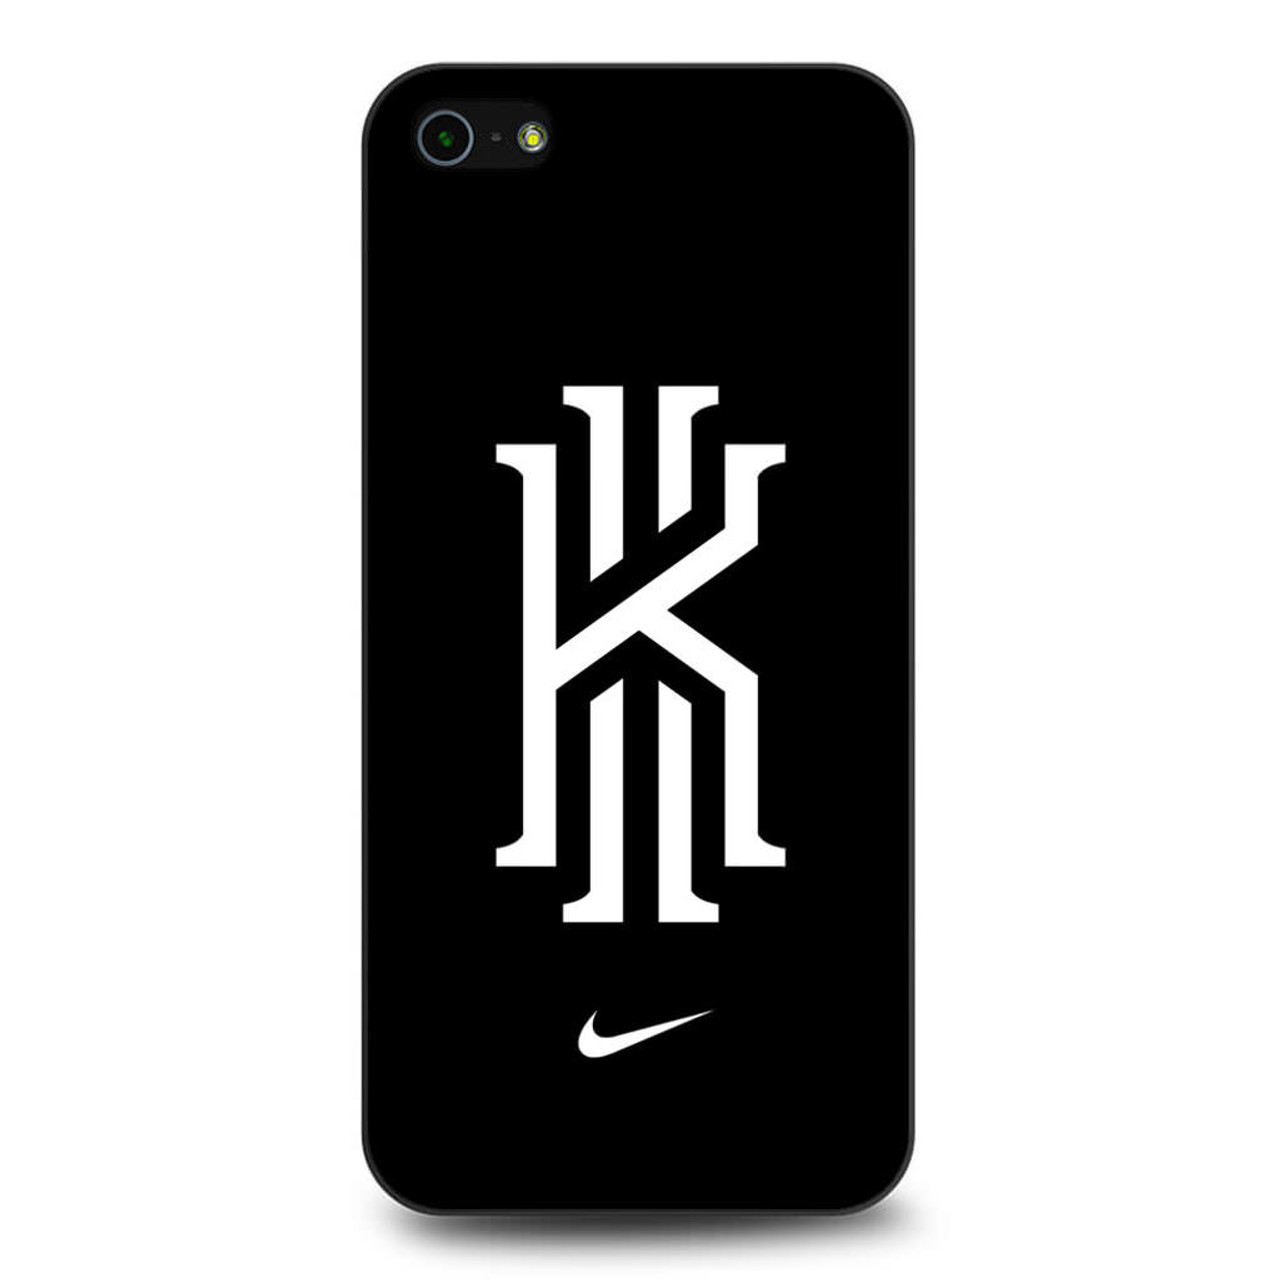 ec7ac8a3eb7b Kyrie Irving Nike Logo Black1 iPhone 5 5S SE Case - CASESHUNTER